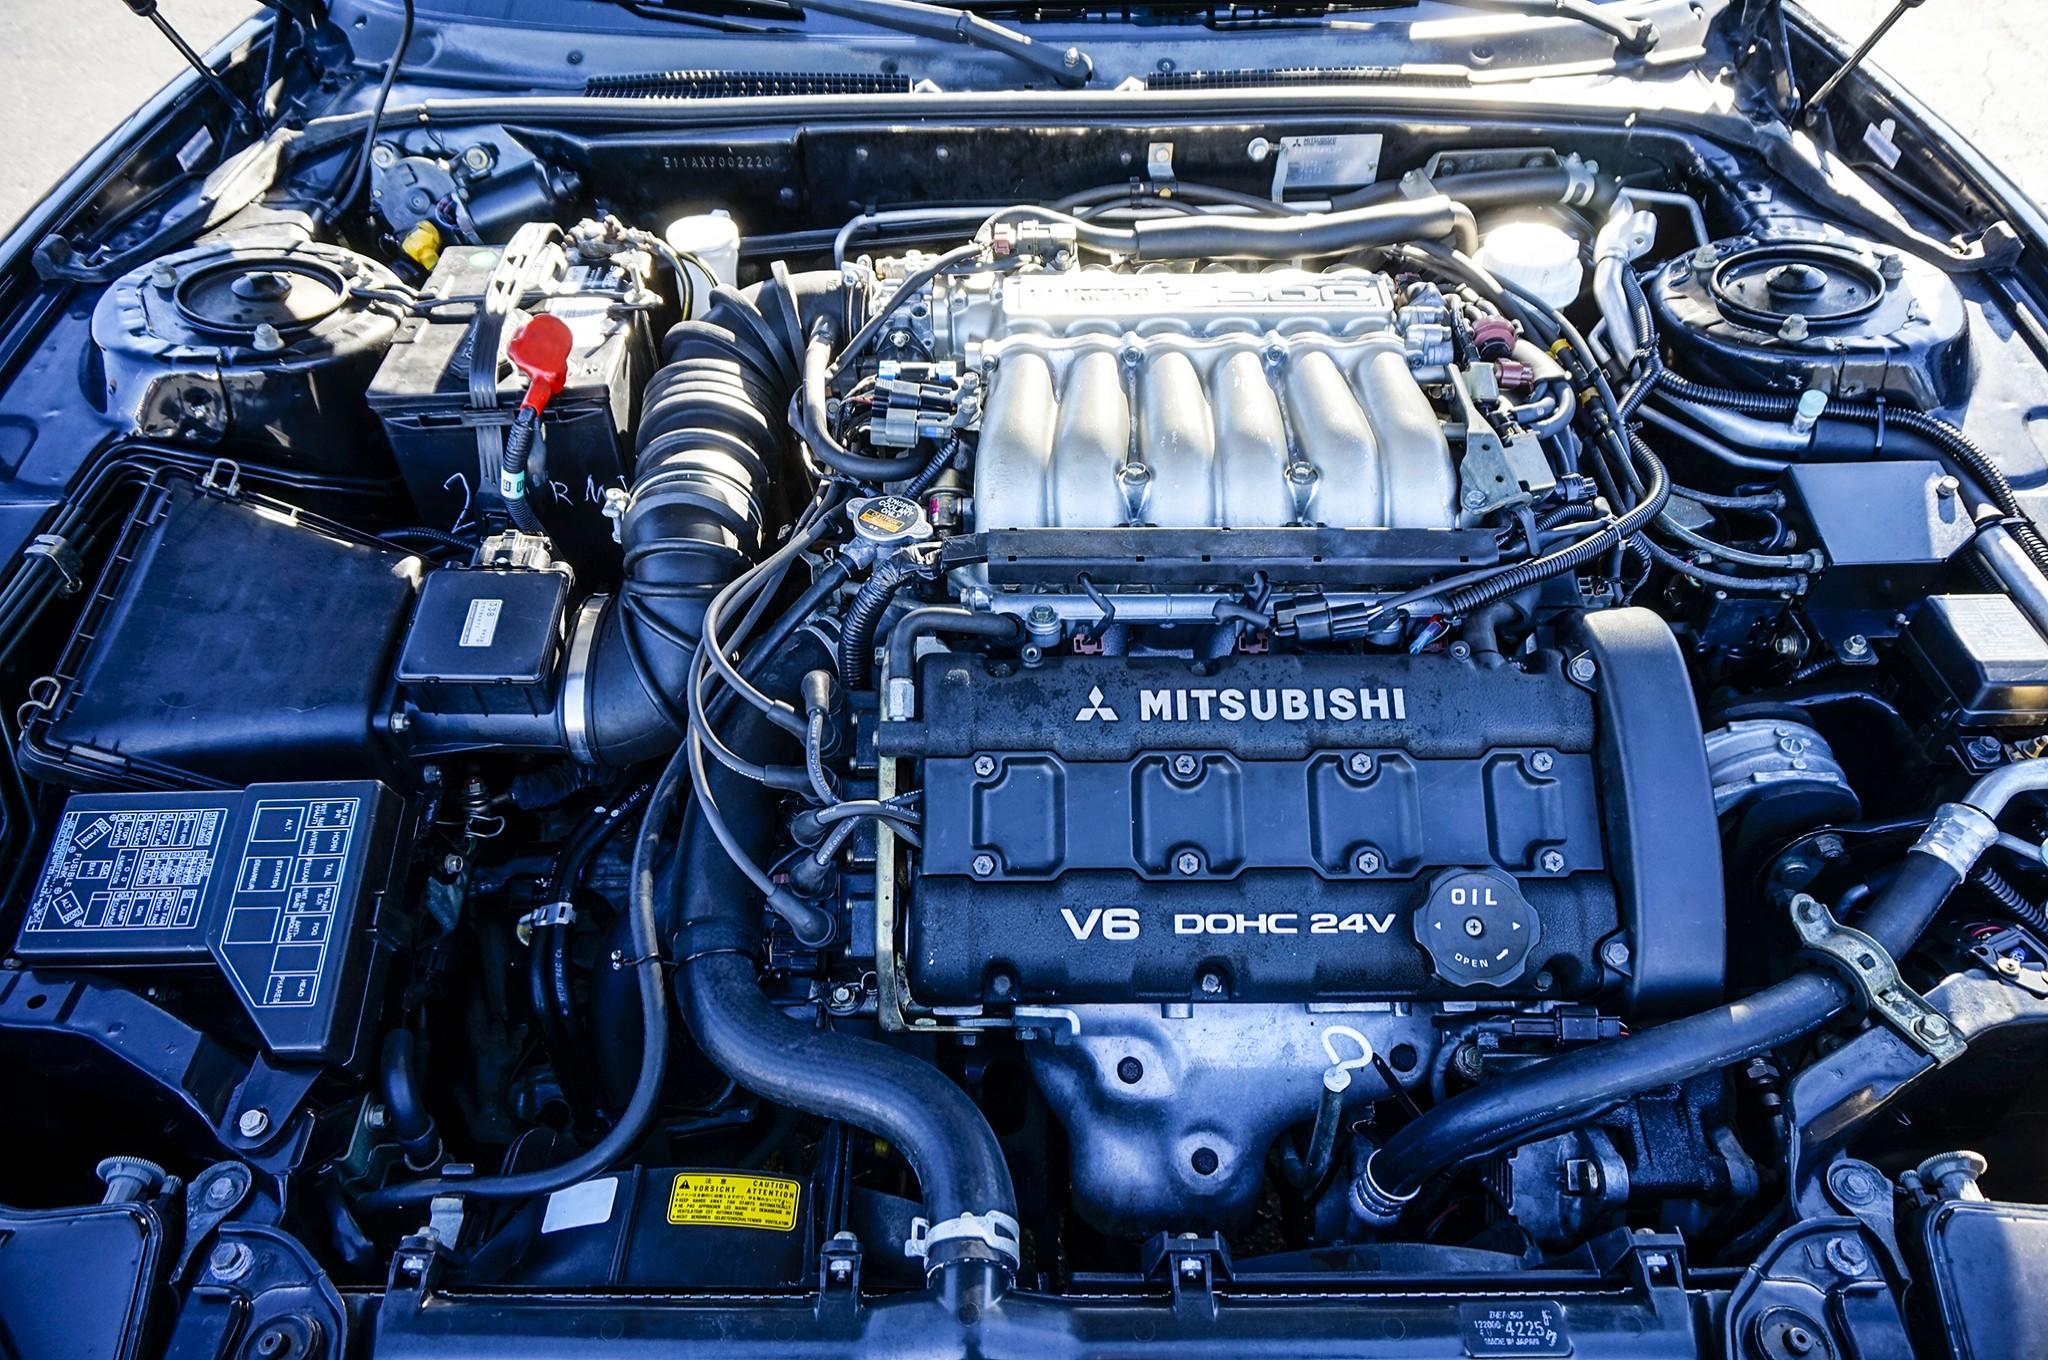 1999 mitsubishi 3000gt engine. 1999 mitsubishi 3000gt sl fwd 3000gt engine g